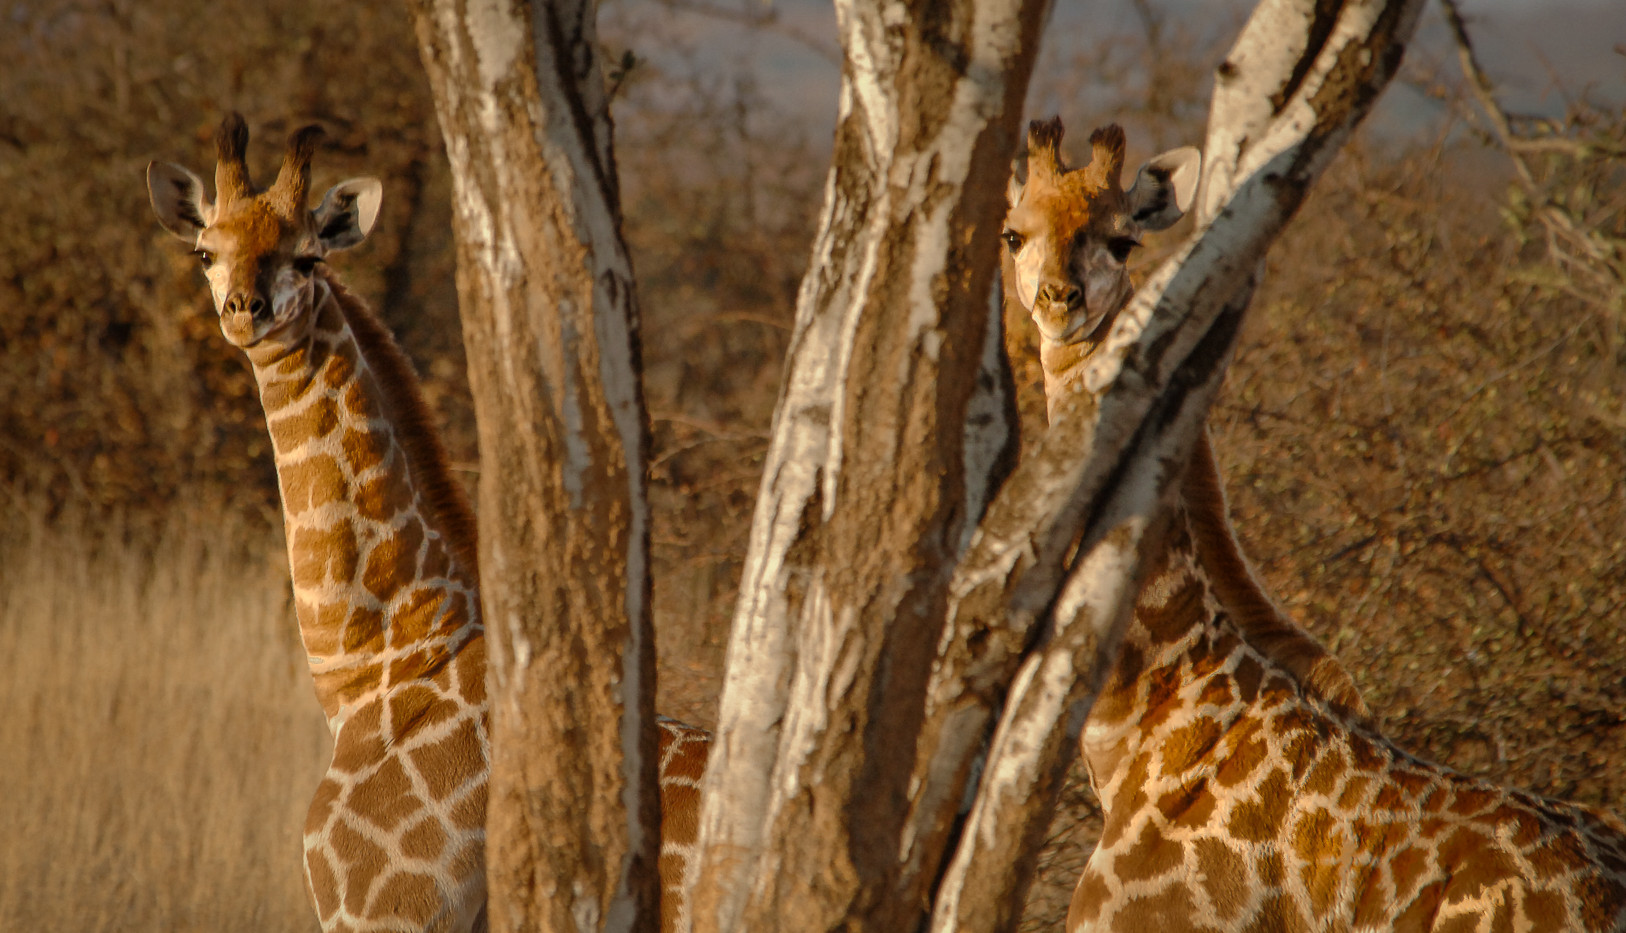 Peeping giraffe